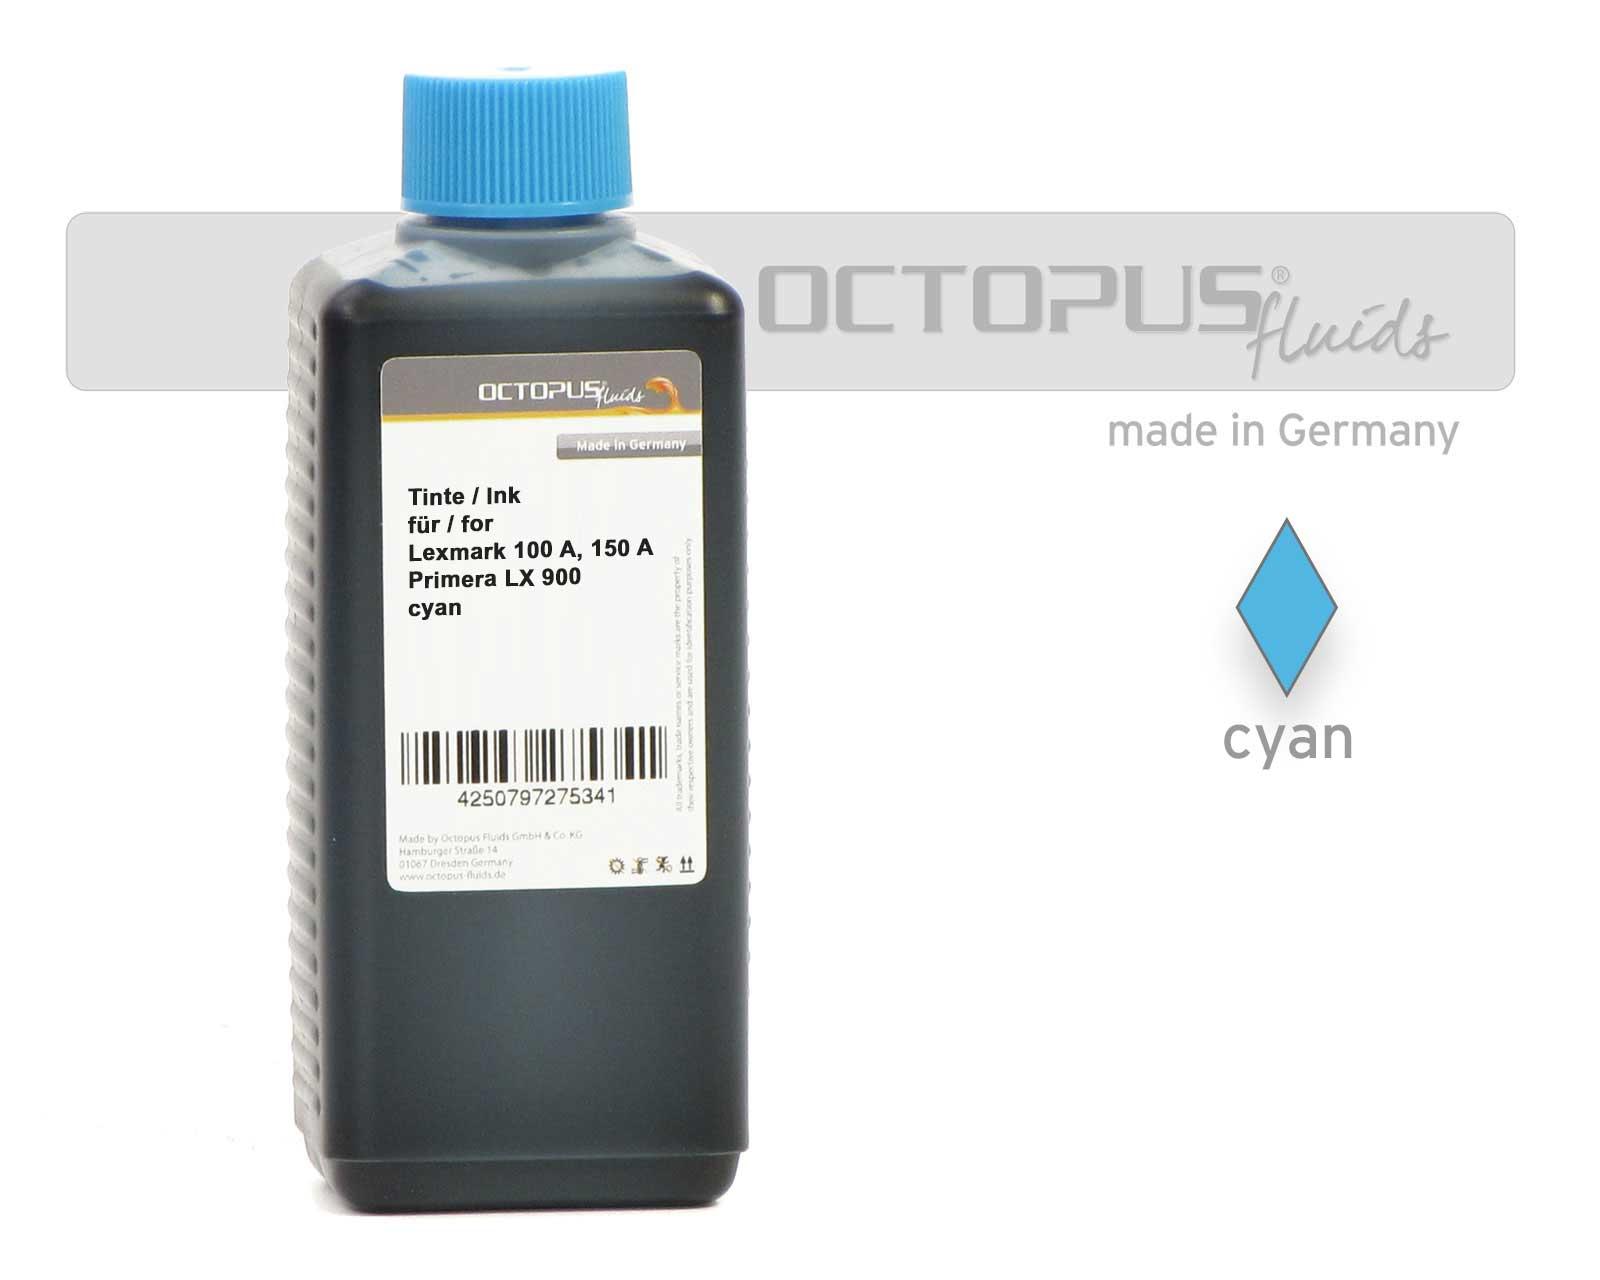 Octopus Tinte für Lexmark 100 A, 150 A, Primera LX 900 cyan